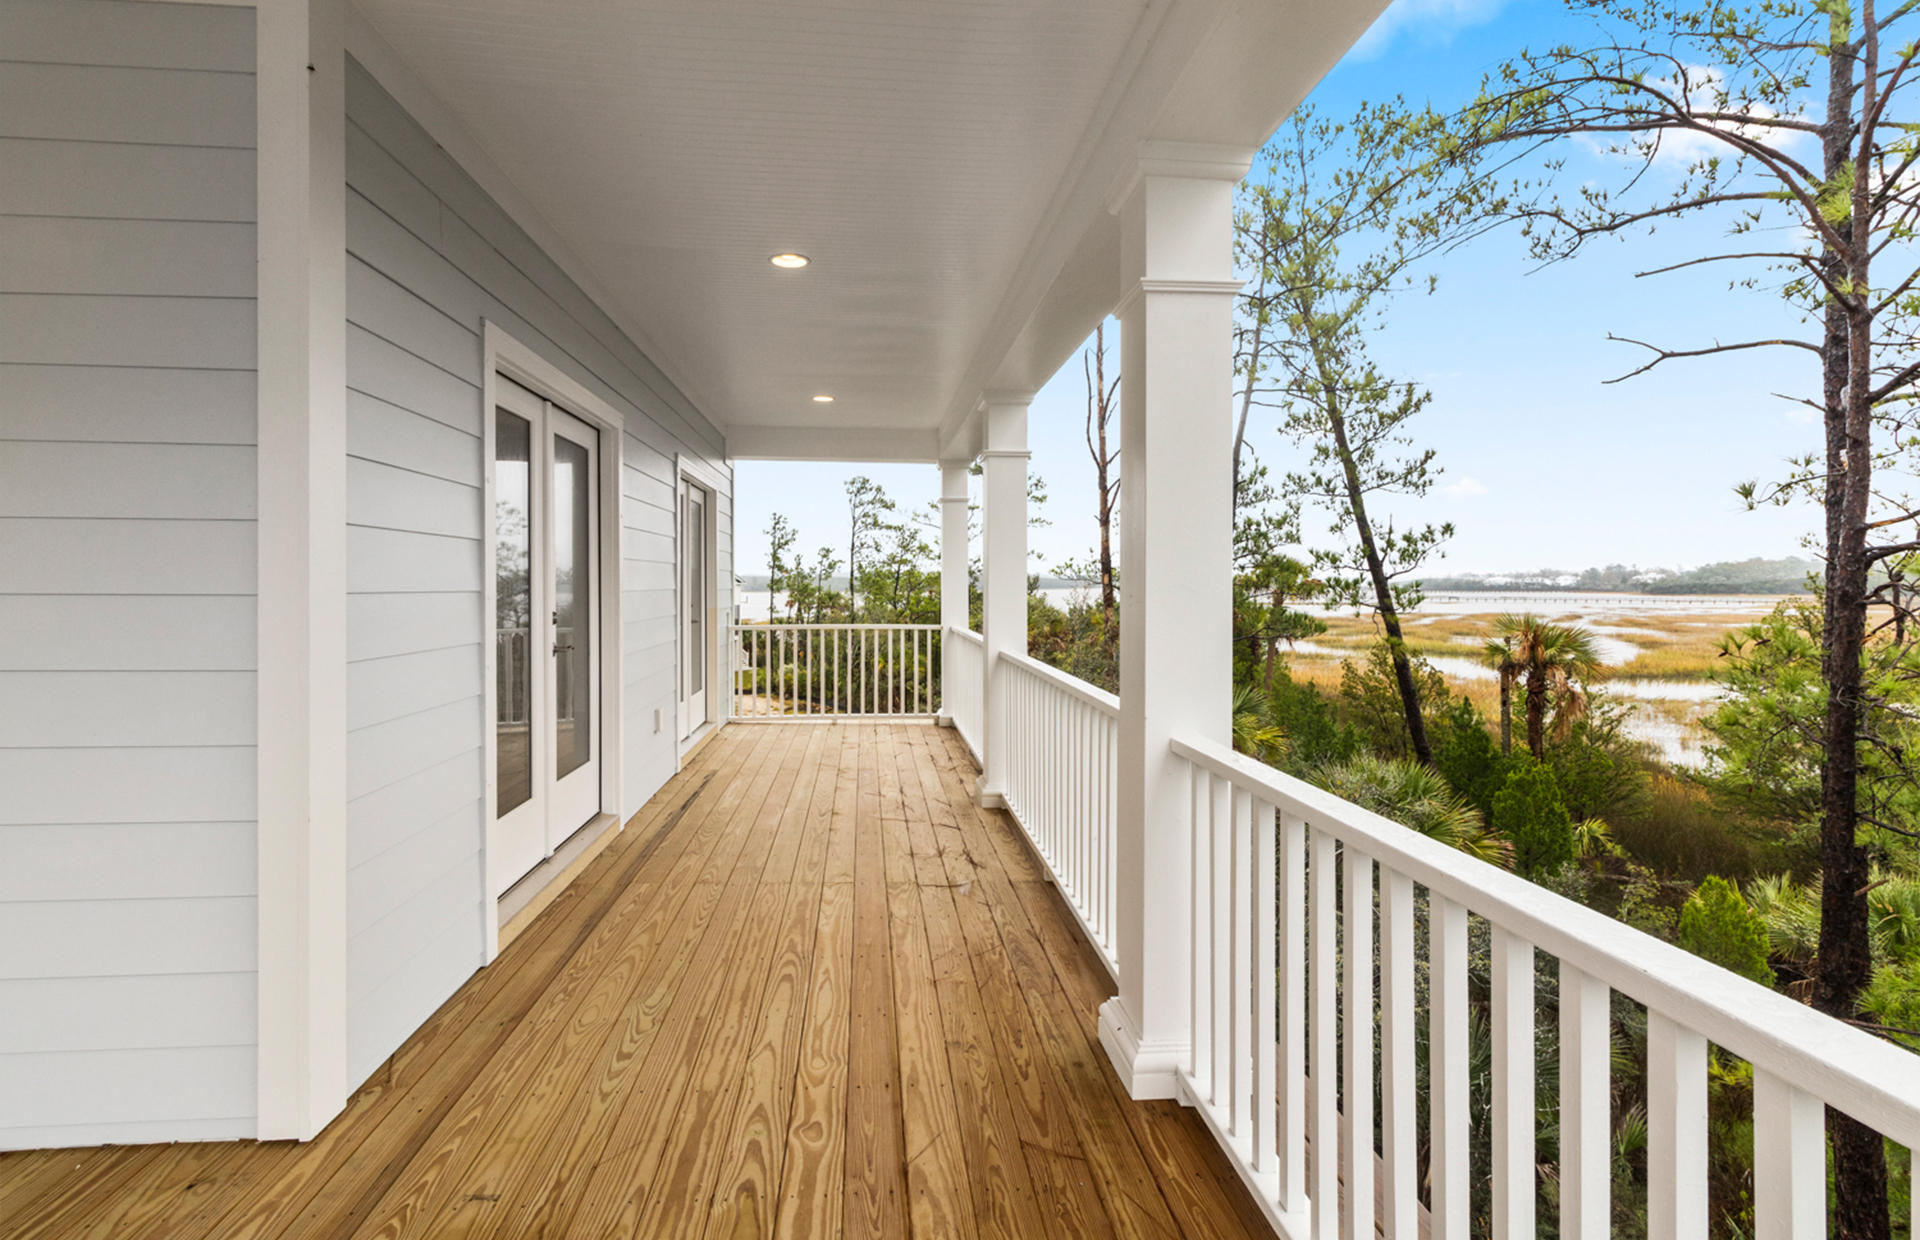 Dunes West Homes For Sale - 2324 Bucktail Court, Mount Pleasant, SC - 8